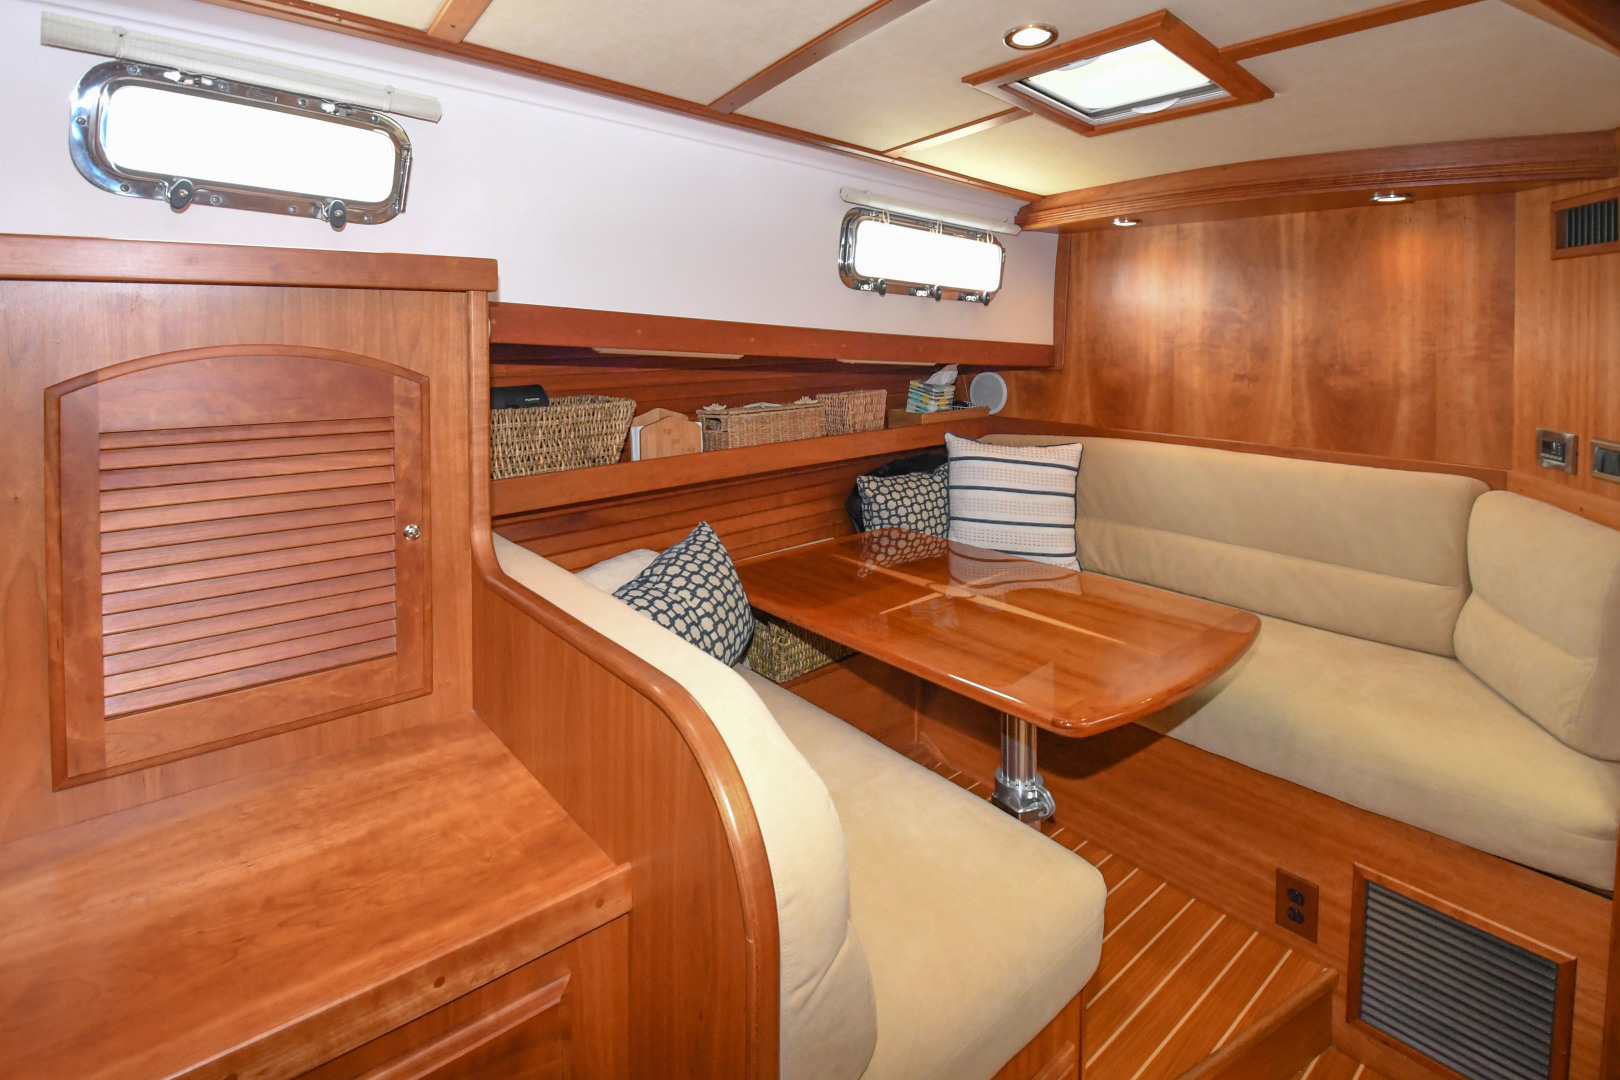 Sabre-40 Express 2010-Impulse Treasure Island-Florida-United States-2010 40 Sabre Express  Impulse  Lower Dinette-1618623 | Thumbnail